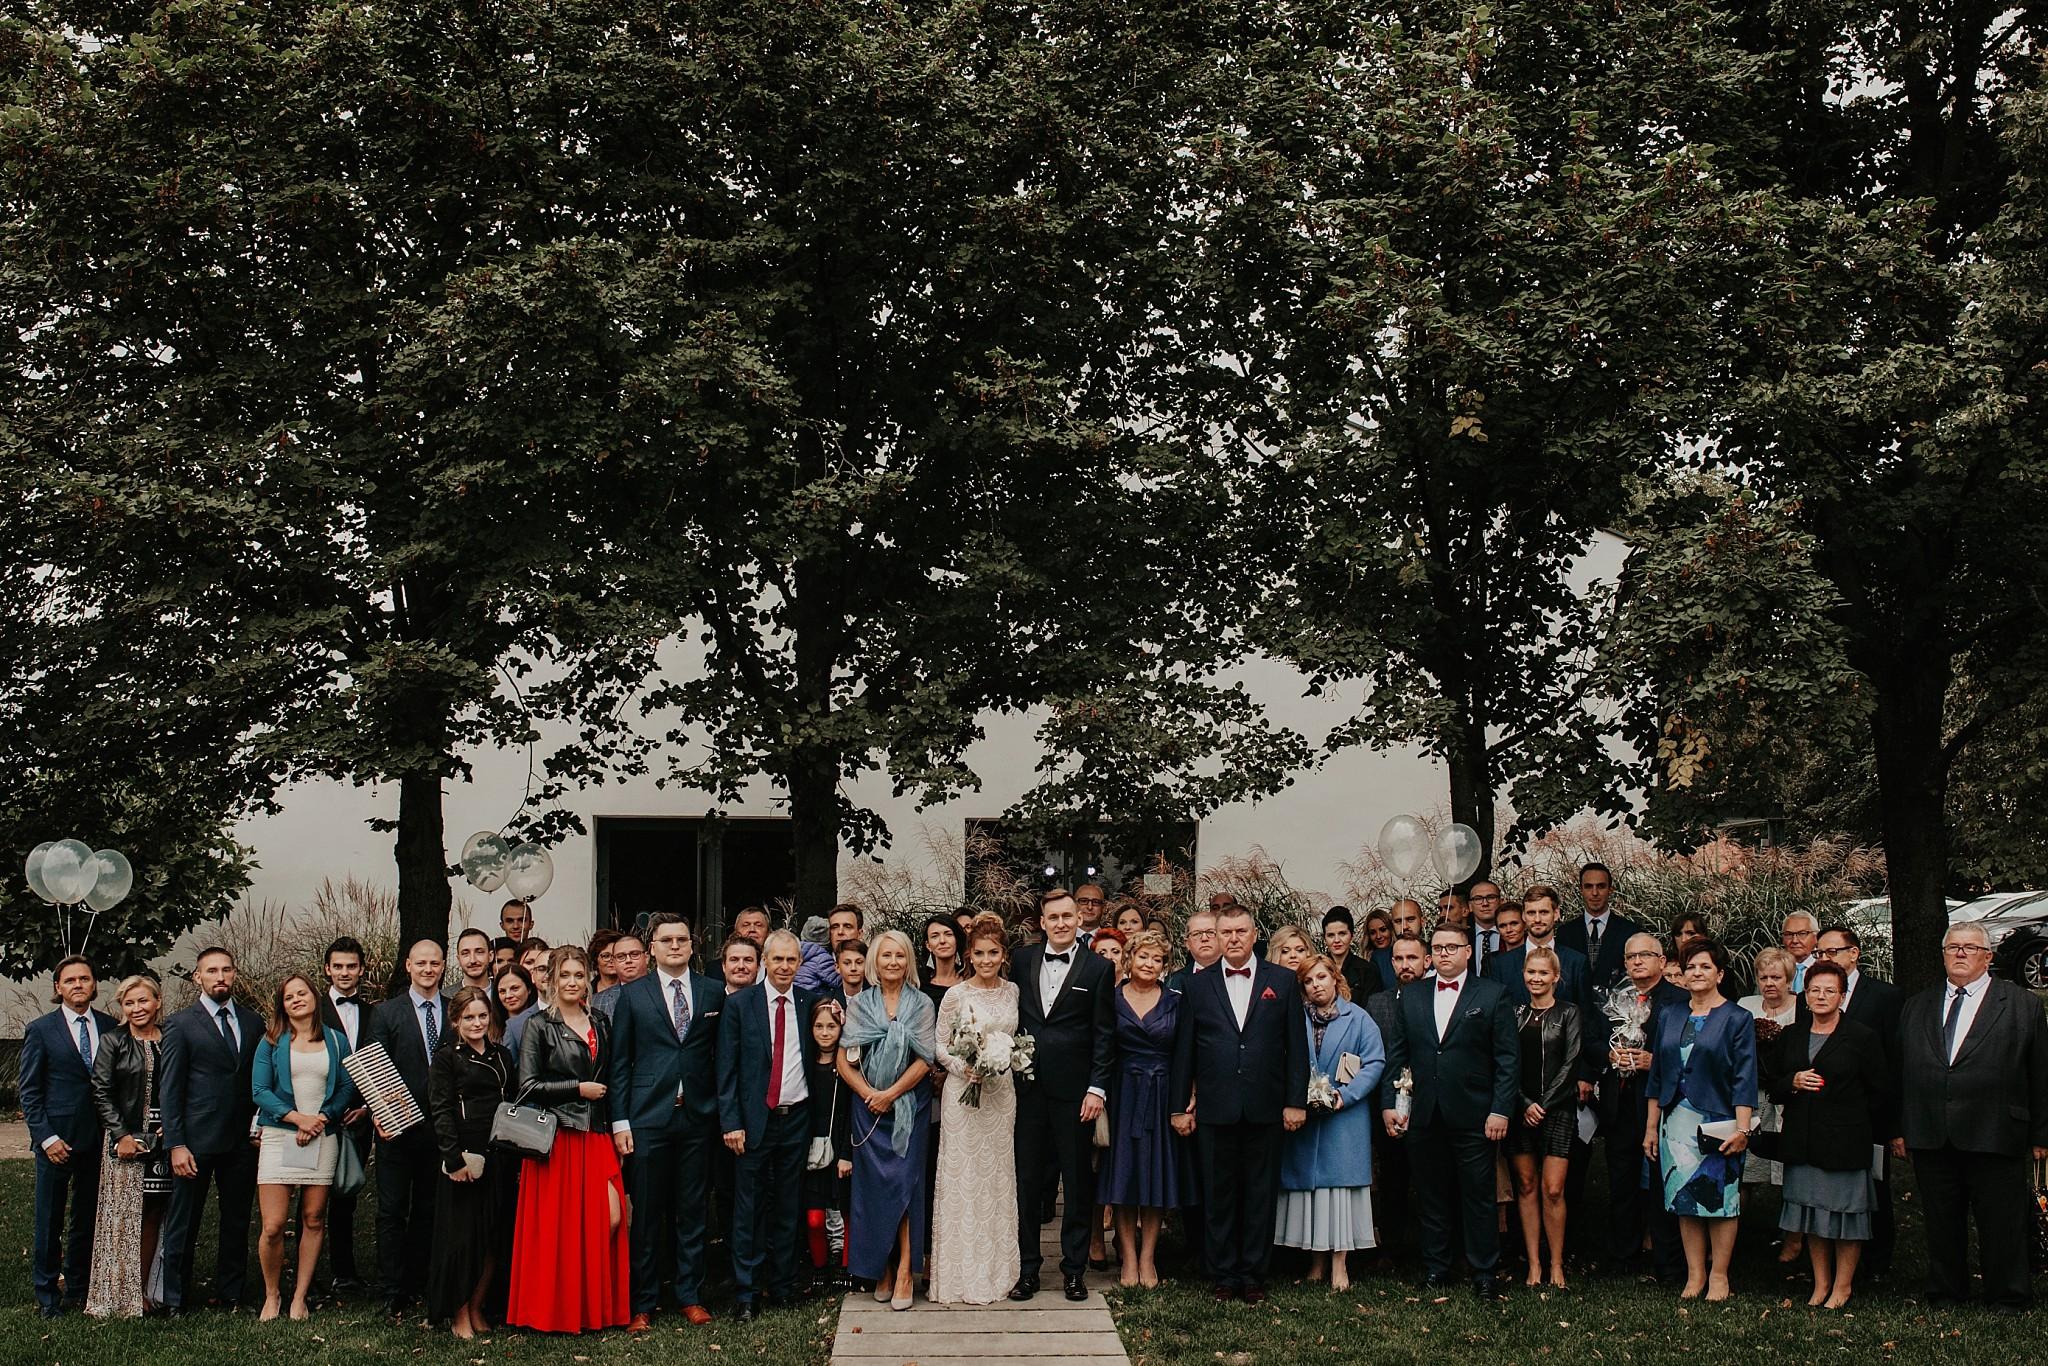 fotograf poznan wesele dobra truskawka piekne wesele pod poznaniem wesele w dobrej truskawce piekna para mloda slub marzen slub koronawirus slub listopad wesele koronawirus 260